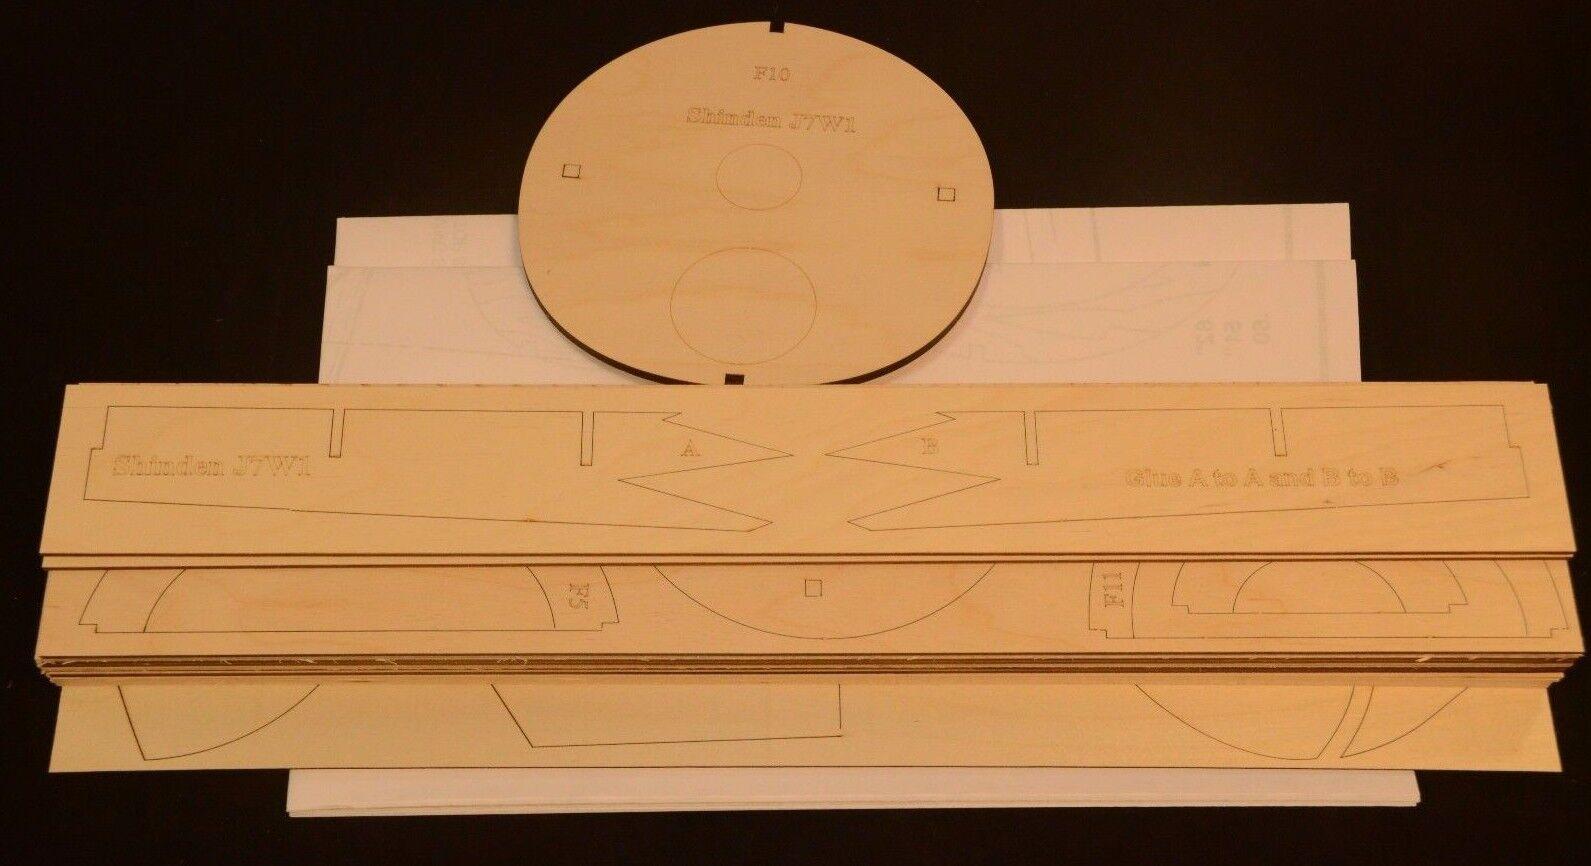 1 5.4 Scale KYUSHU J7W1 SHINDEN Laser Cut Short Kit & Plans 80 in wing span